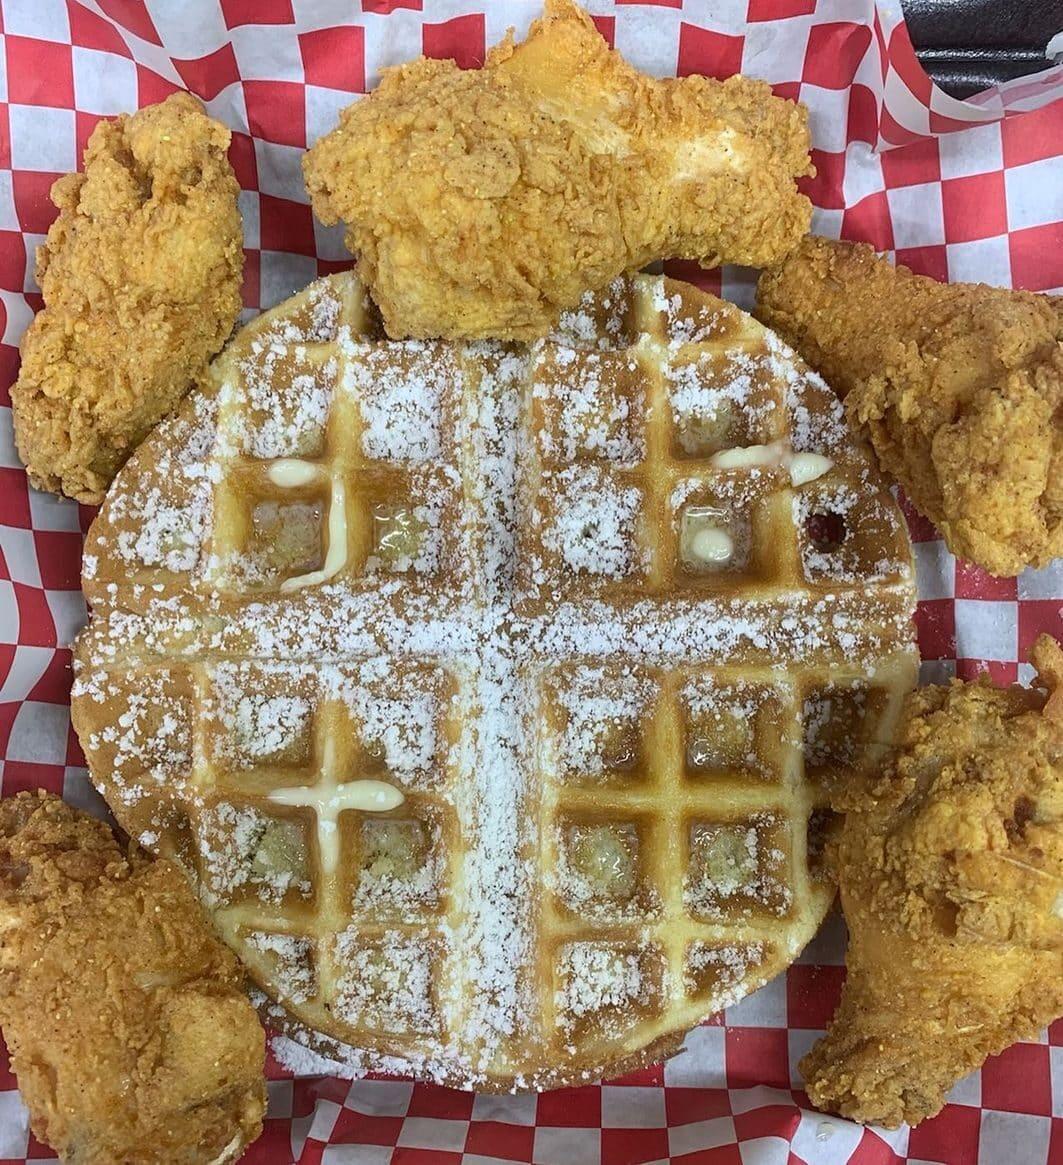 Chicken & Waffles Food Truck